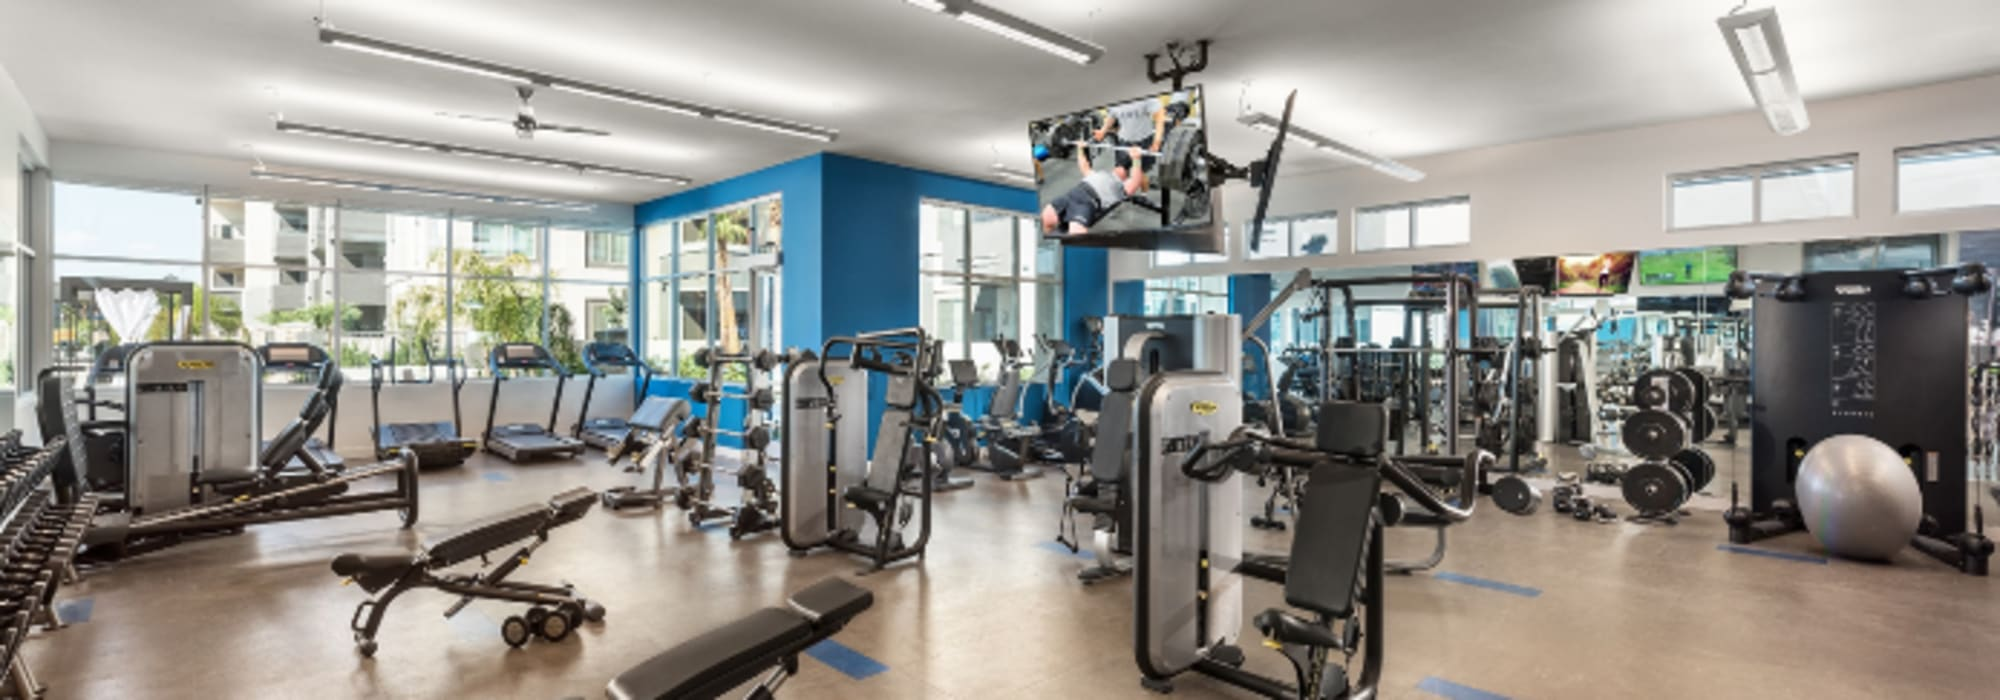 state of the art fitness center at Aviva in Mesa, Arizona